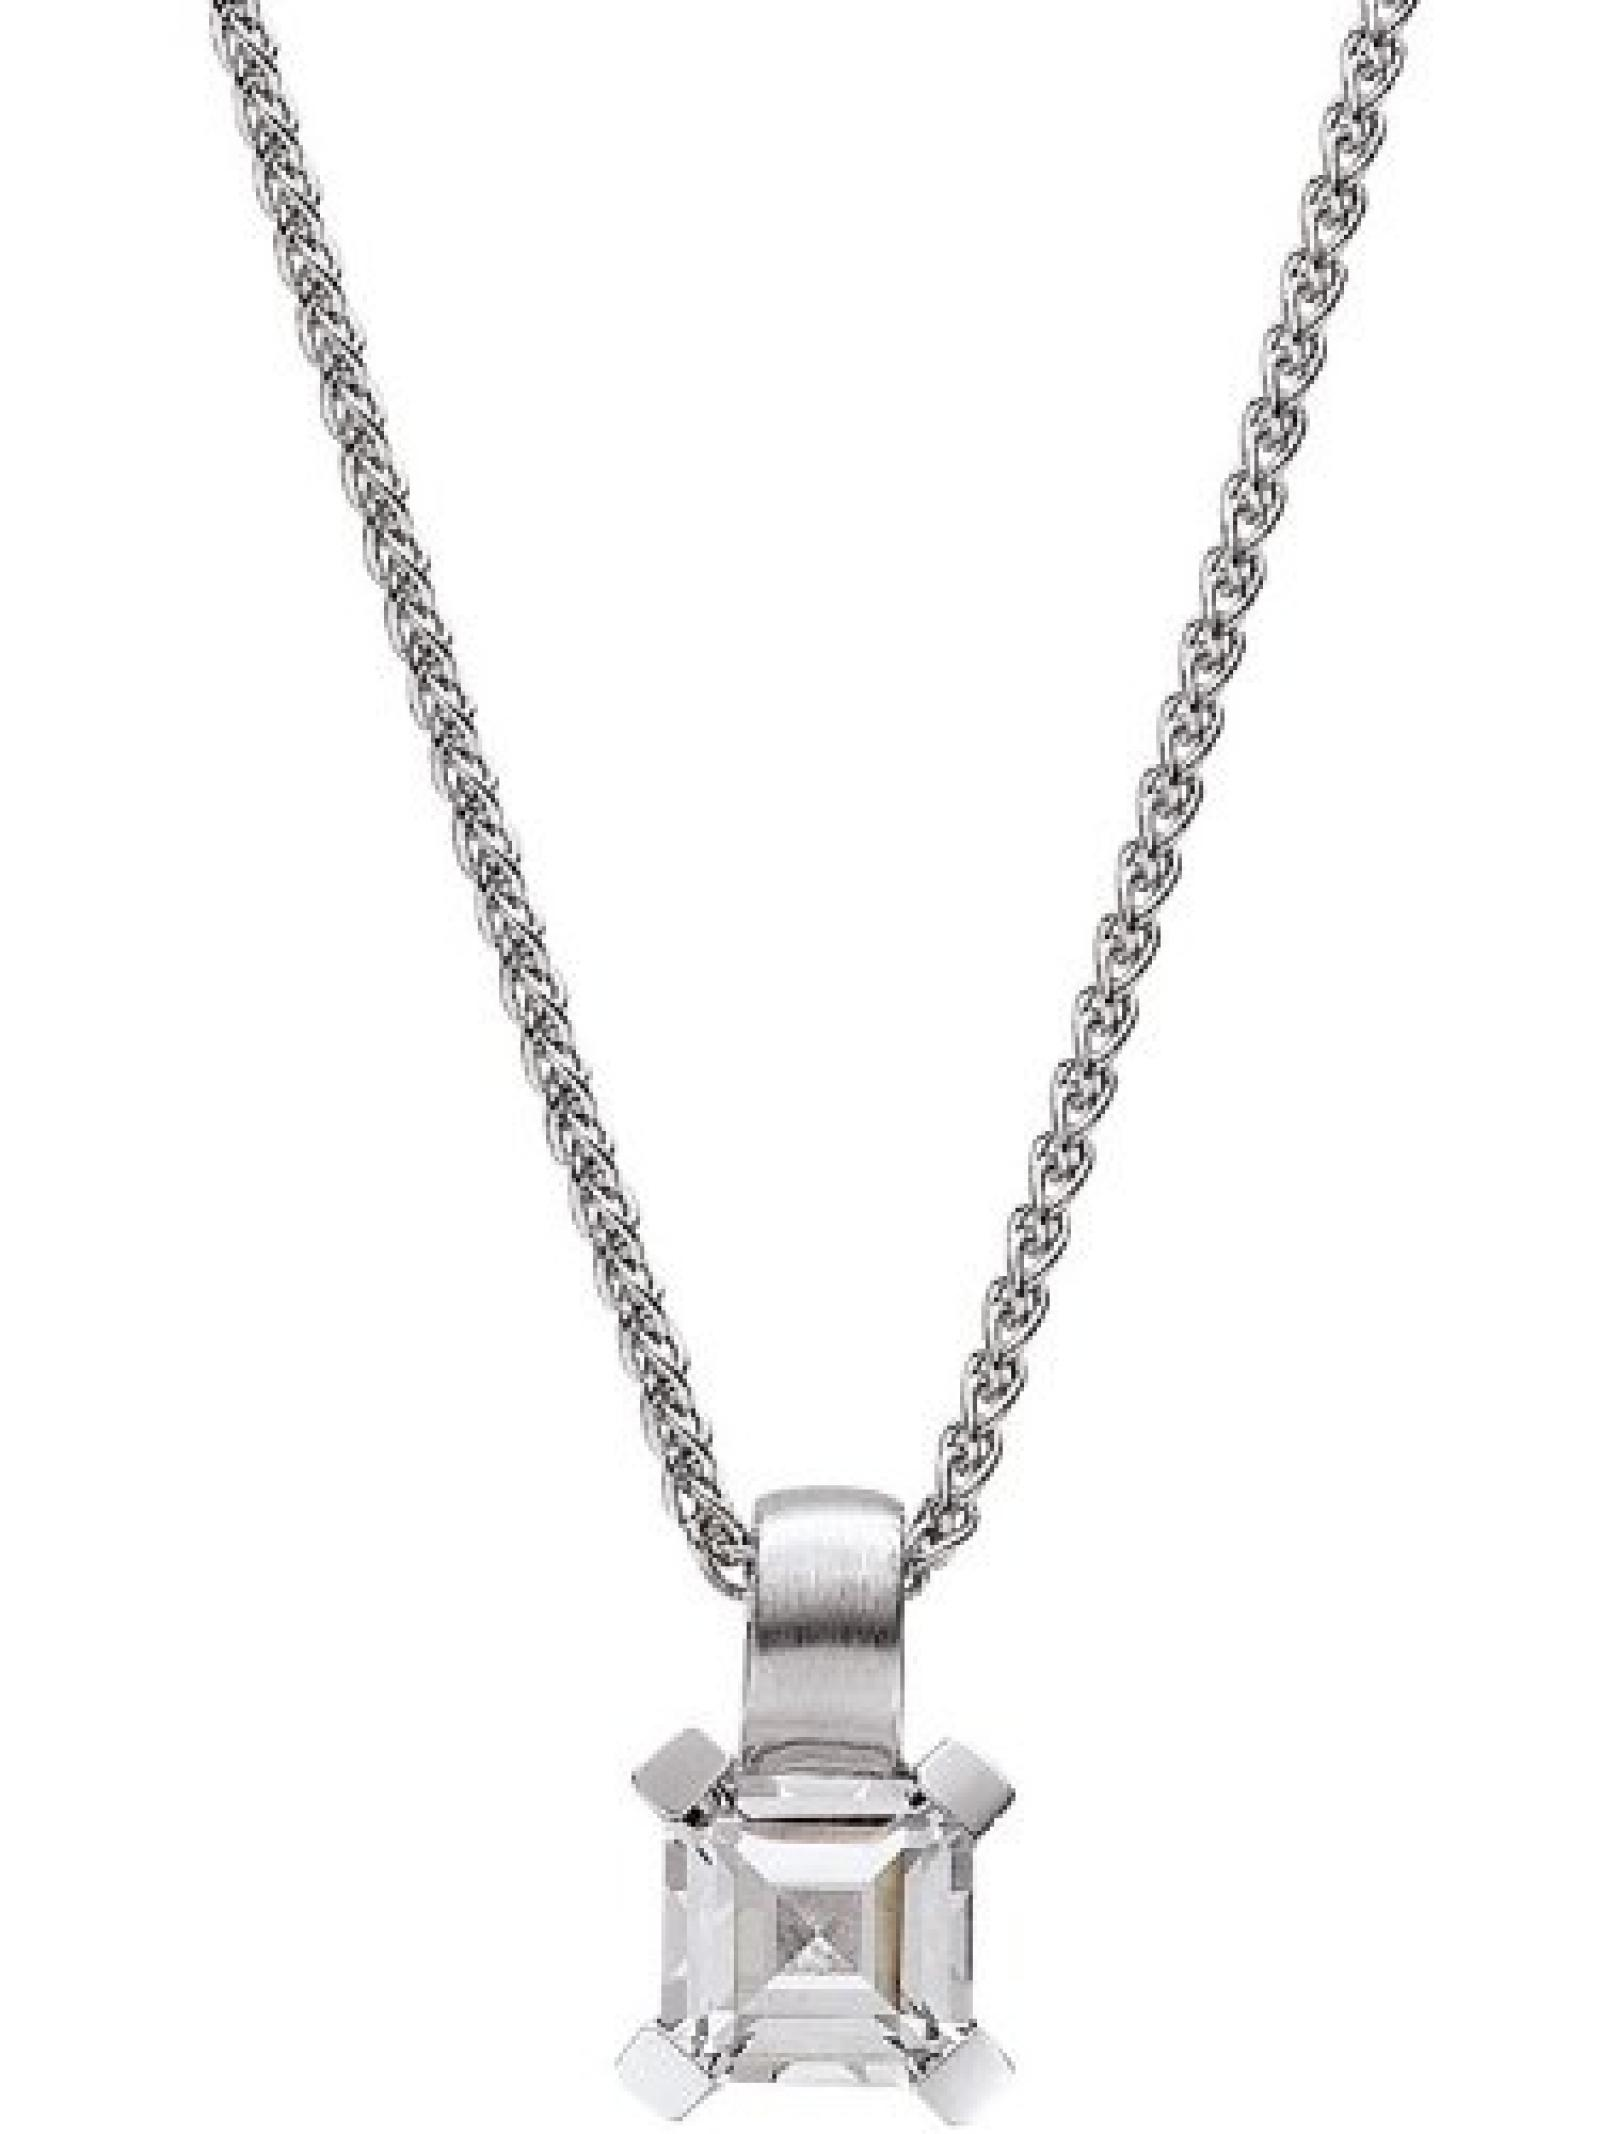 Viventy Damencollier 925 Sterling Silber mit Zirkonia 695422